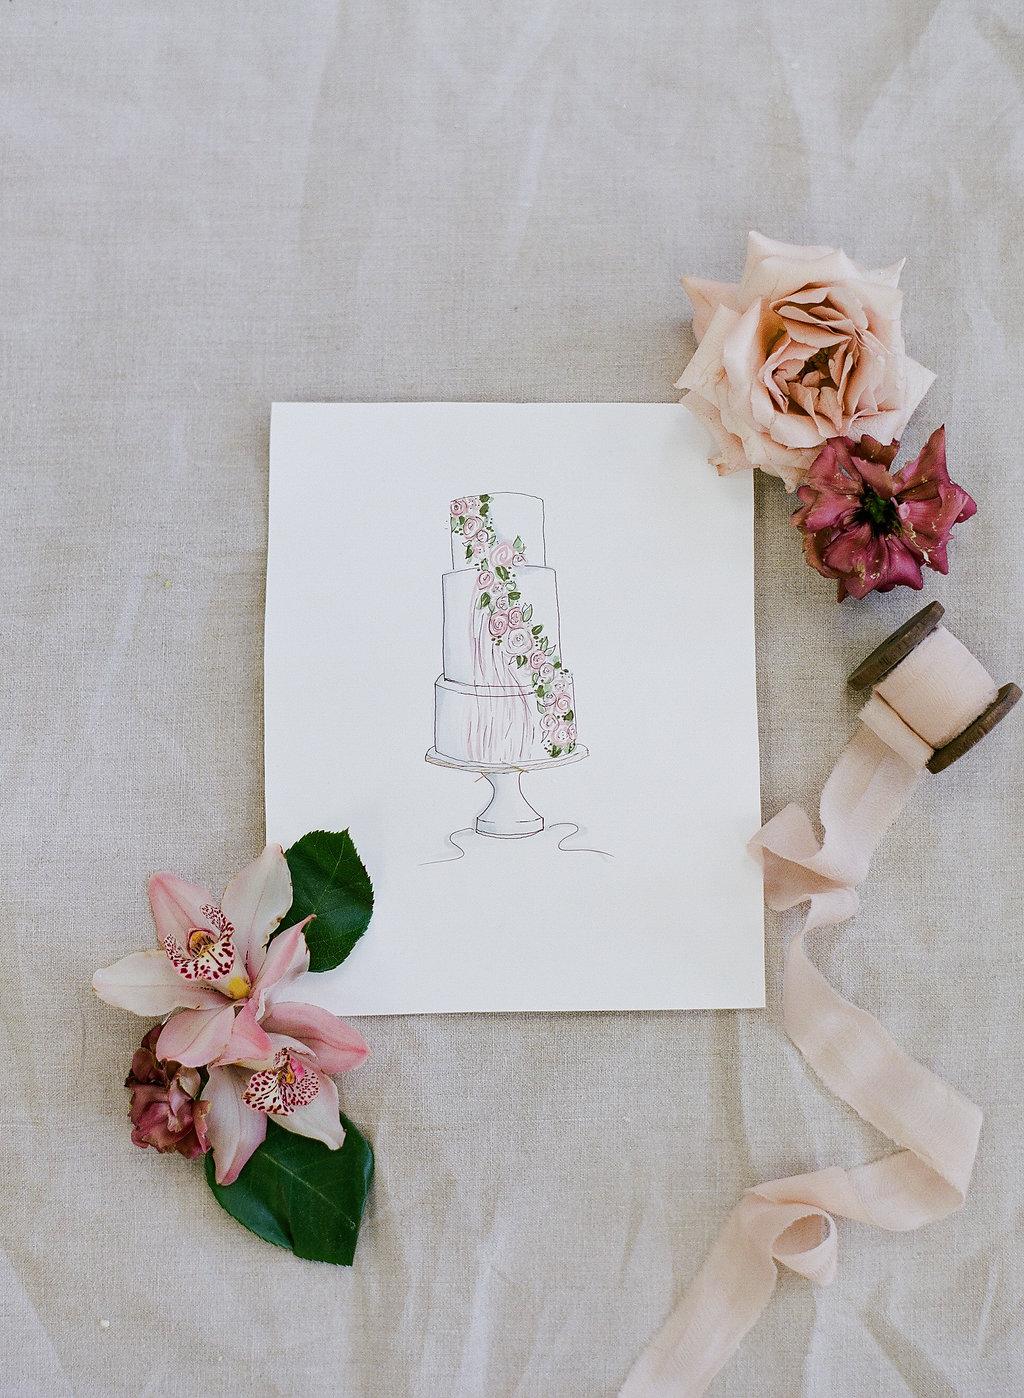 JennySoiPhotography-Sketchbookseries-BTS-181.jpg